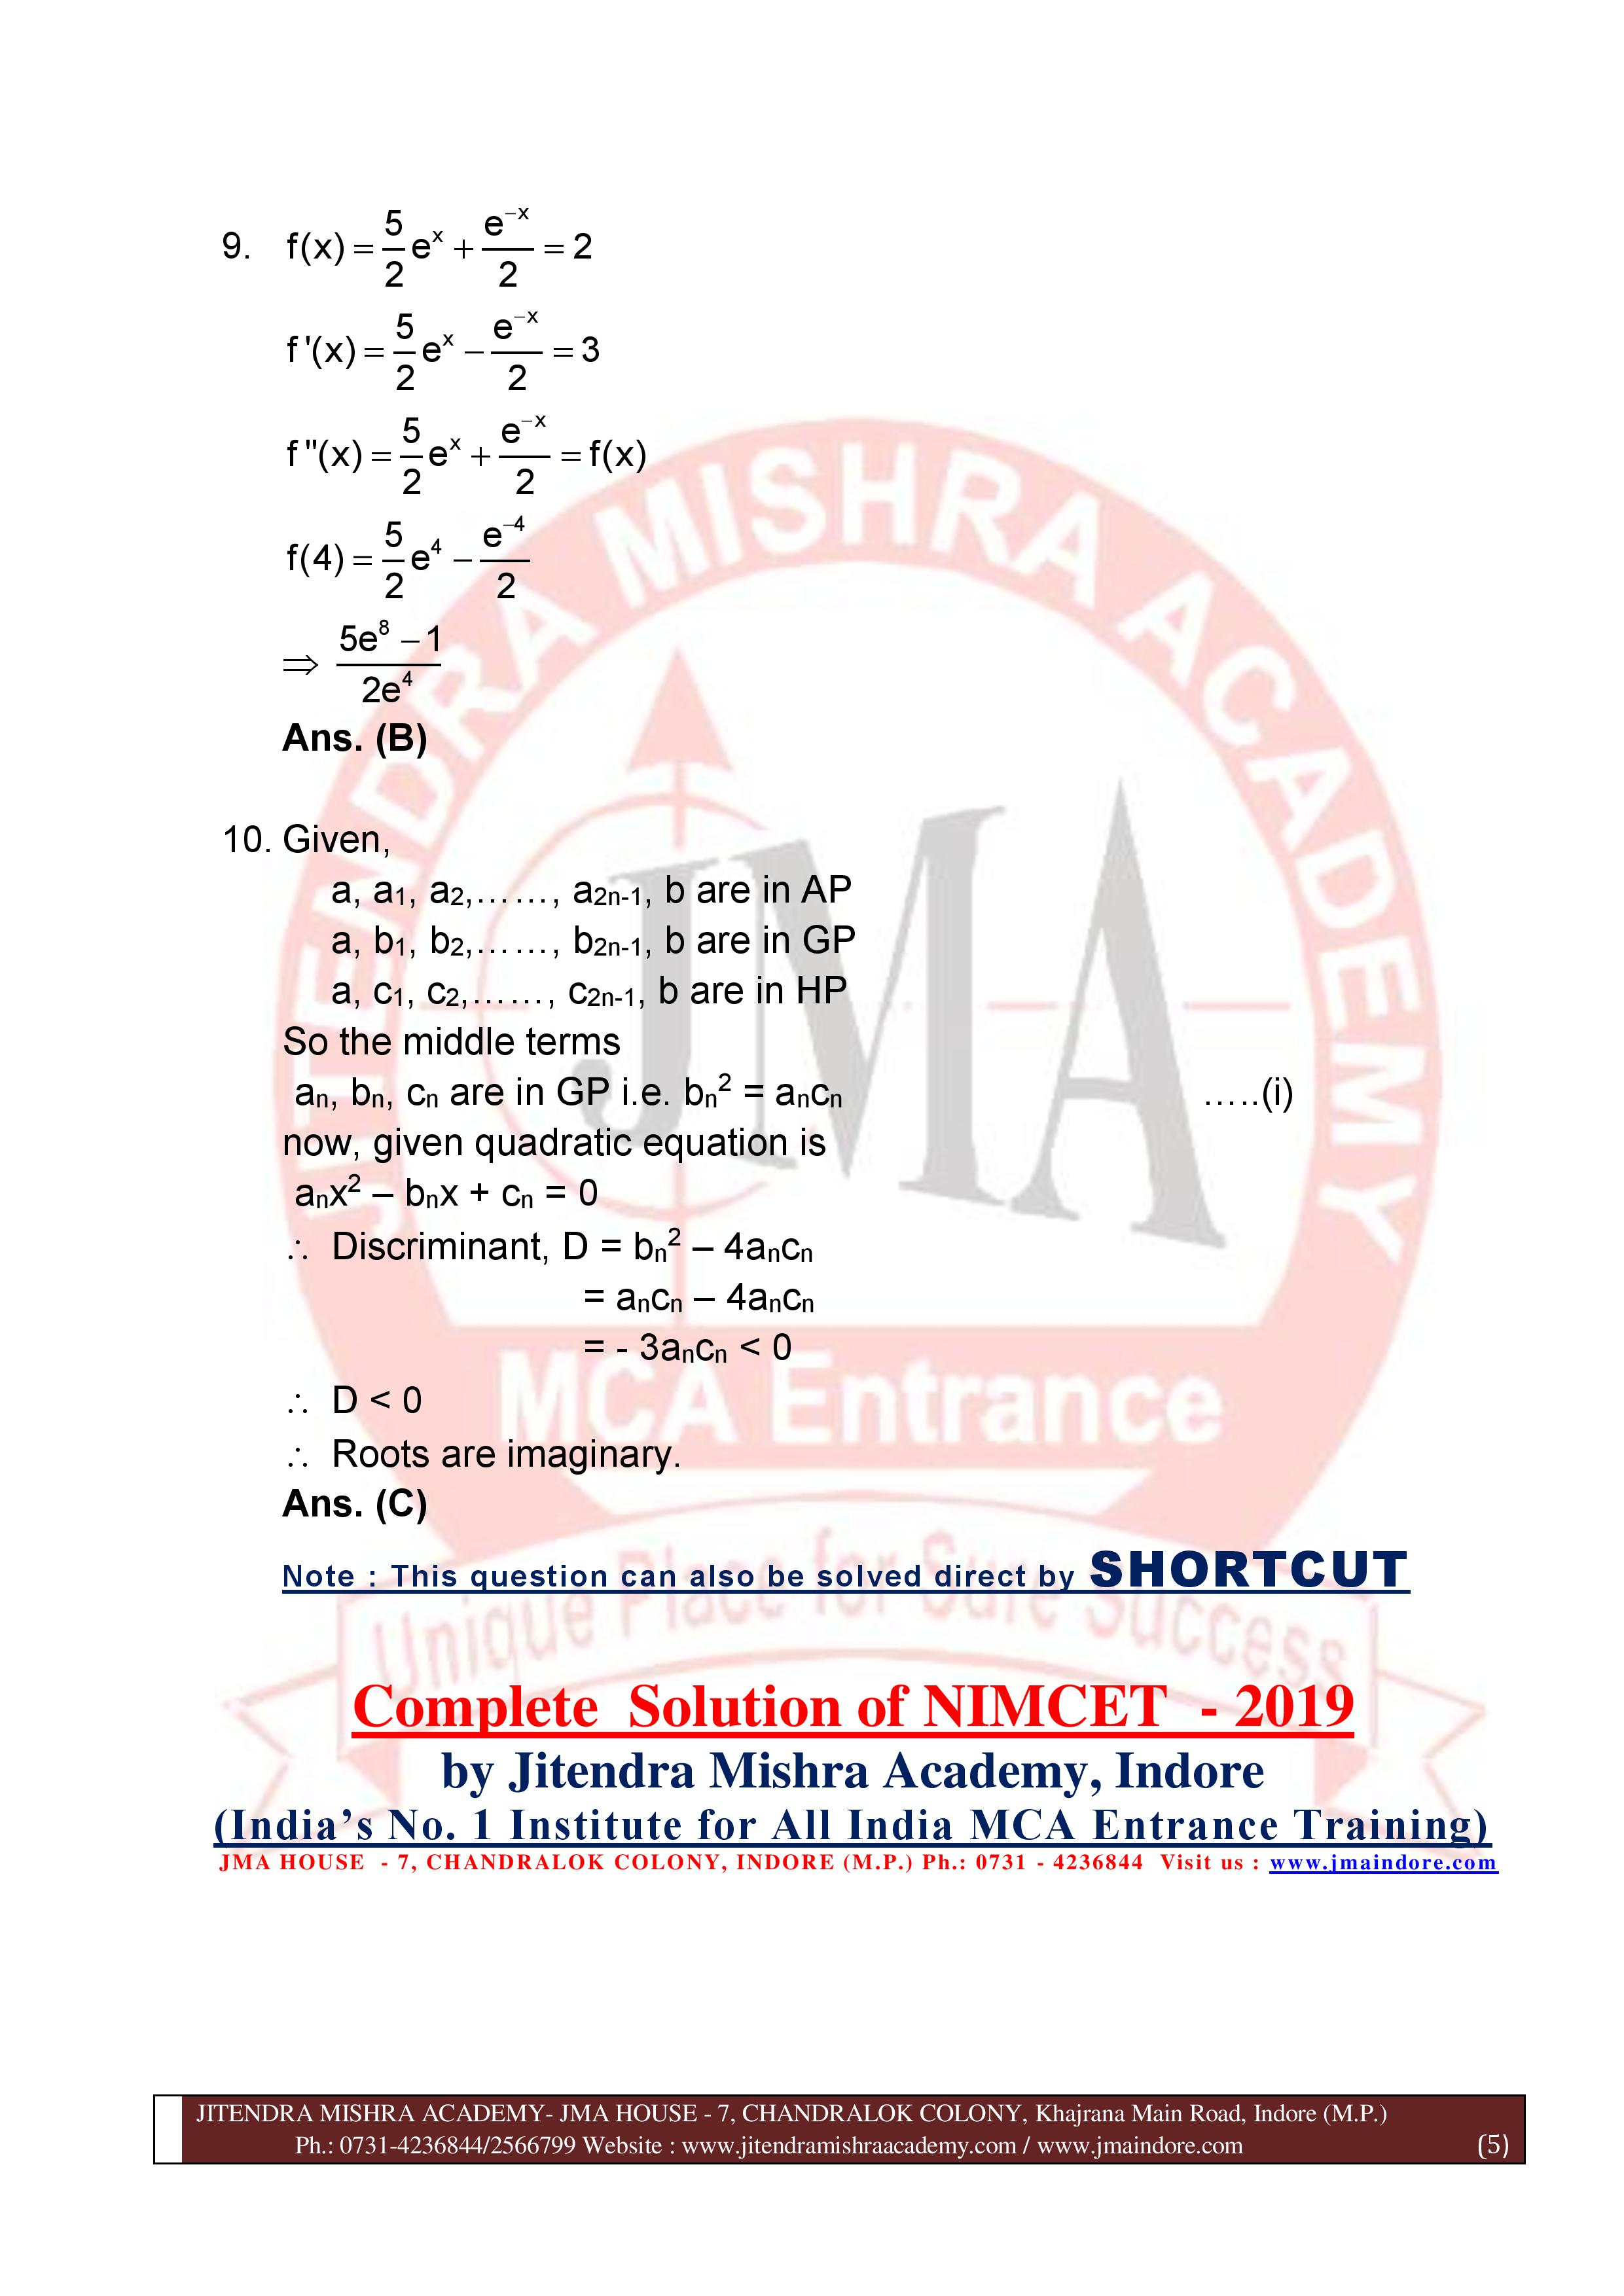 NIMCET 2019 SOLUTION (SET - A)-page-005